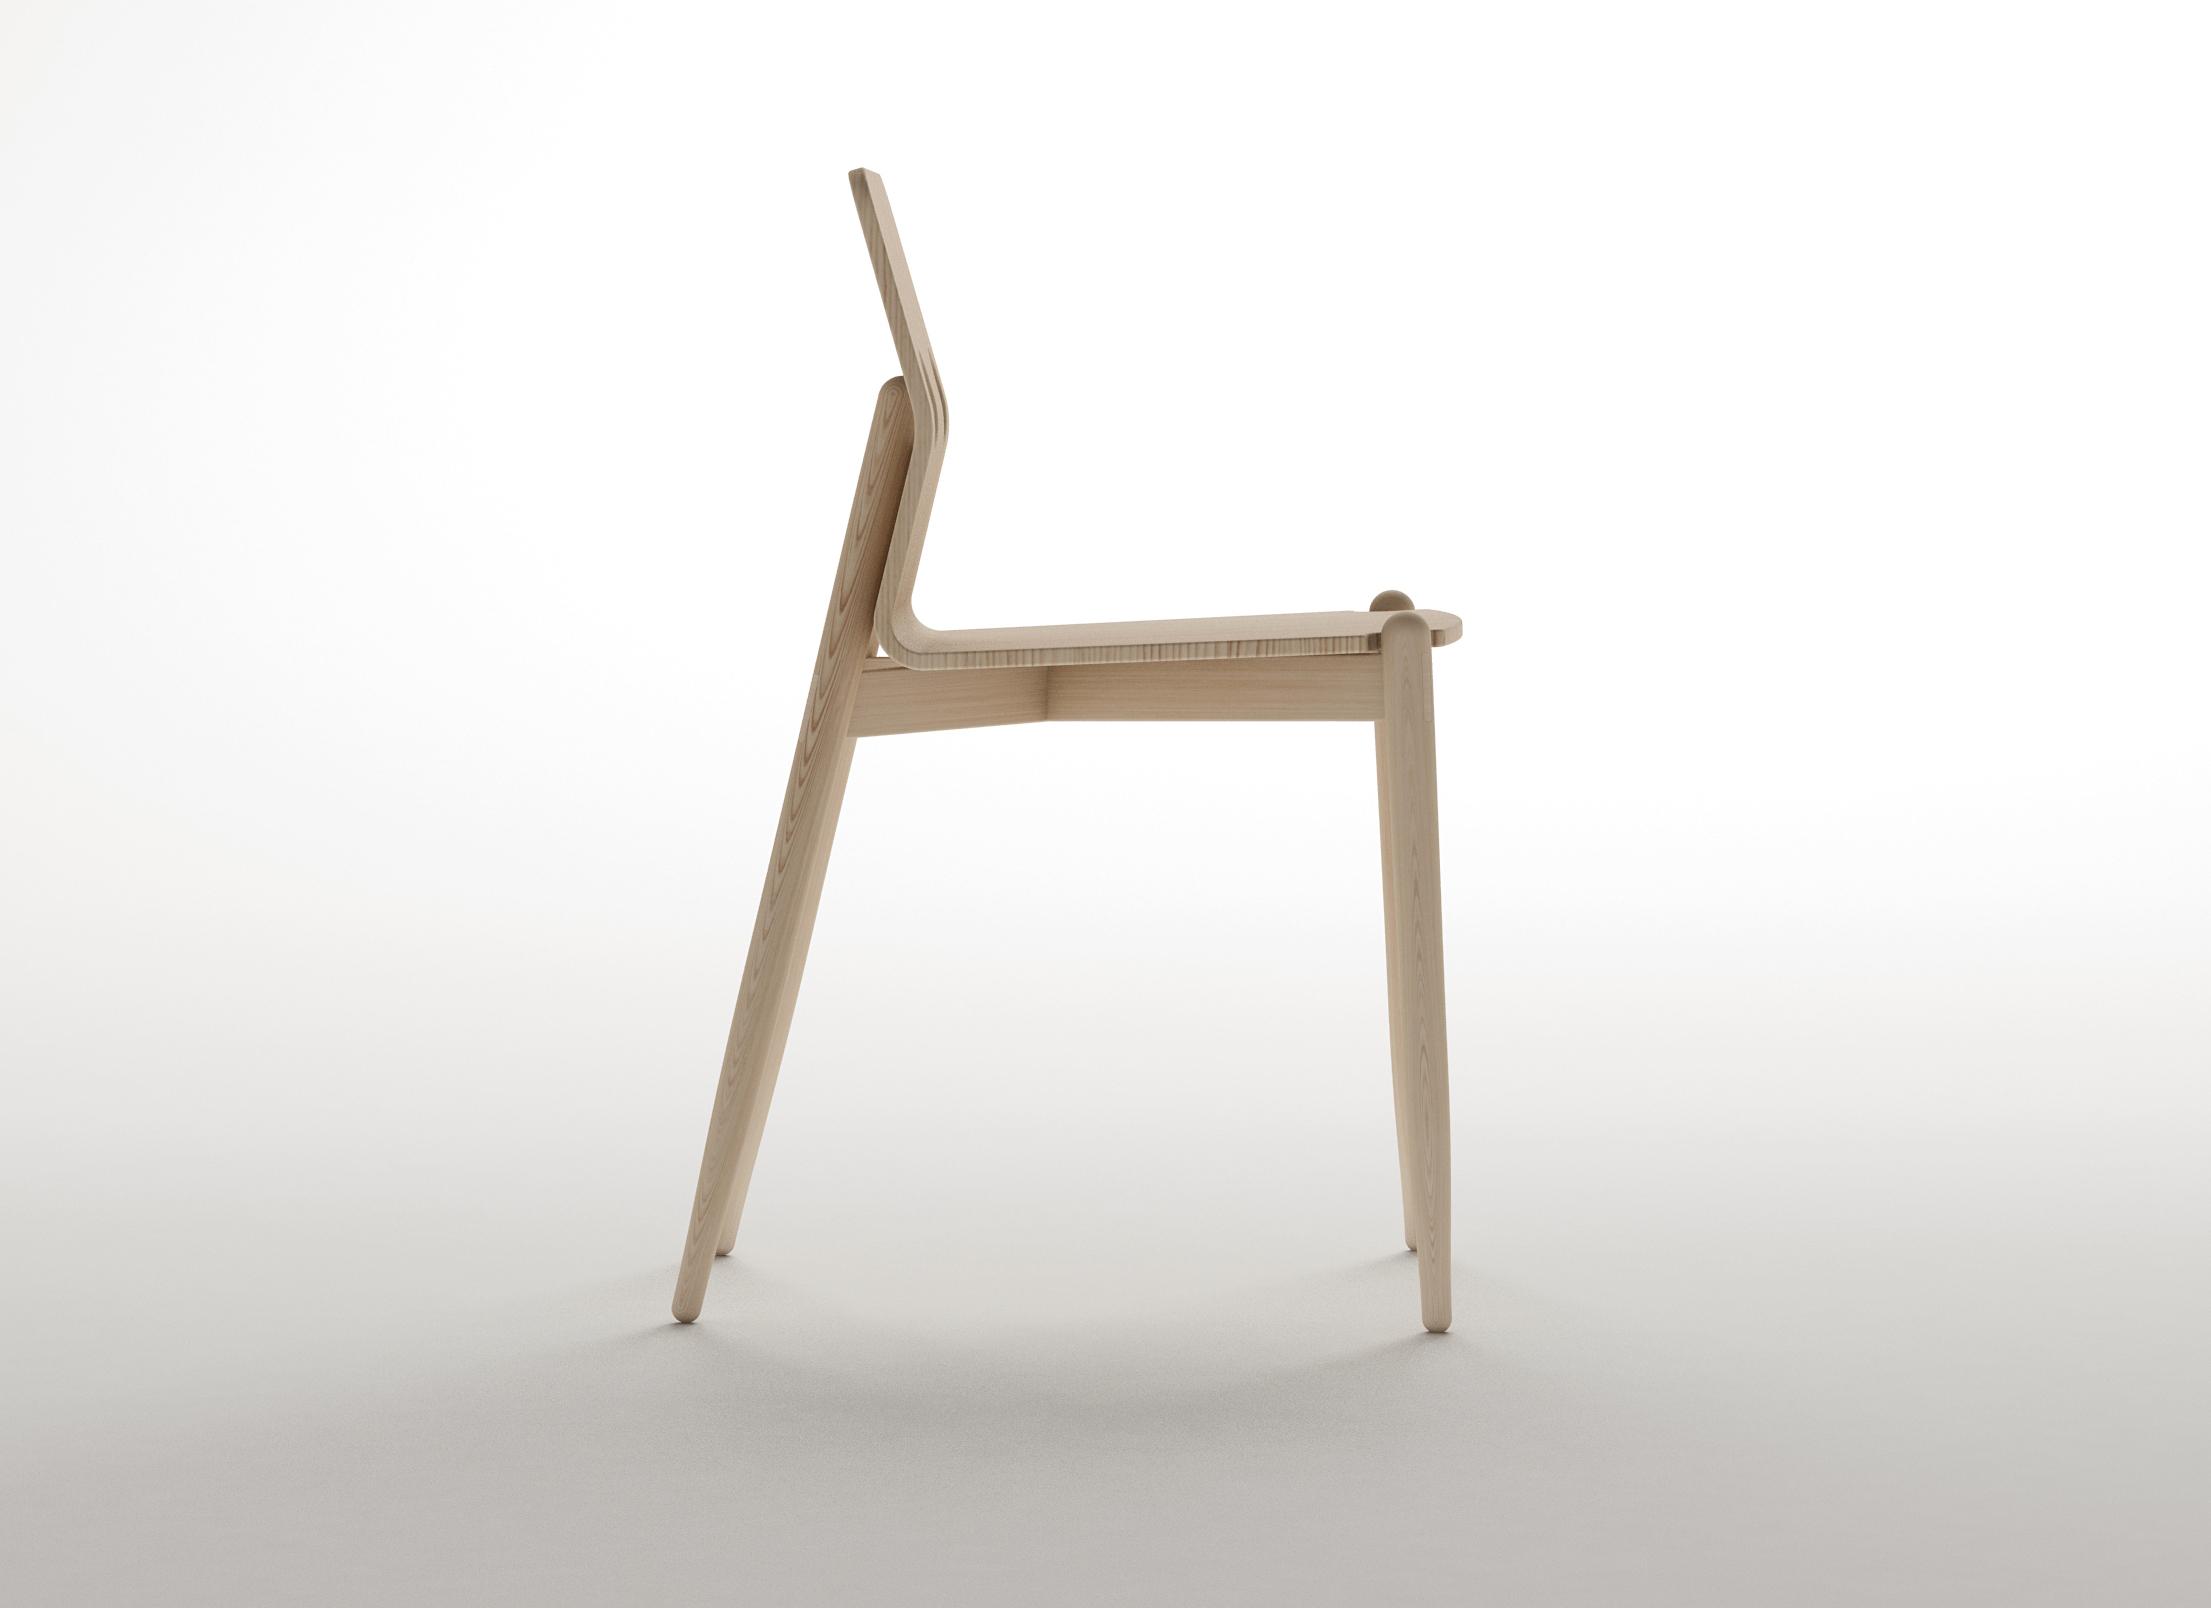 Chaise C-1